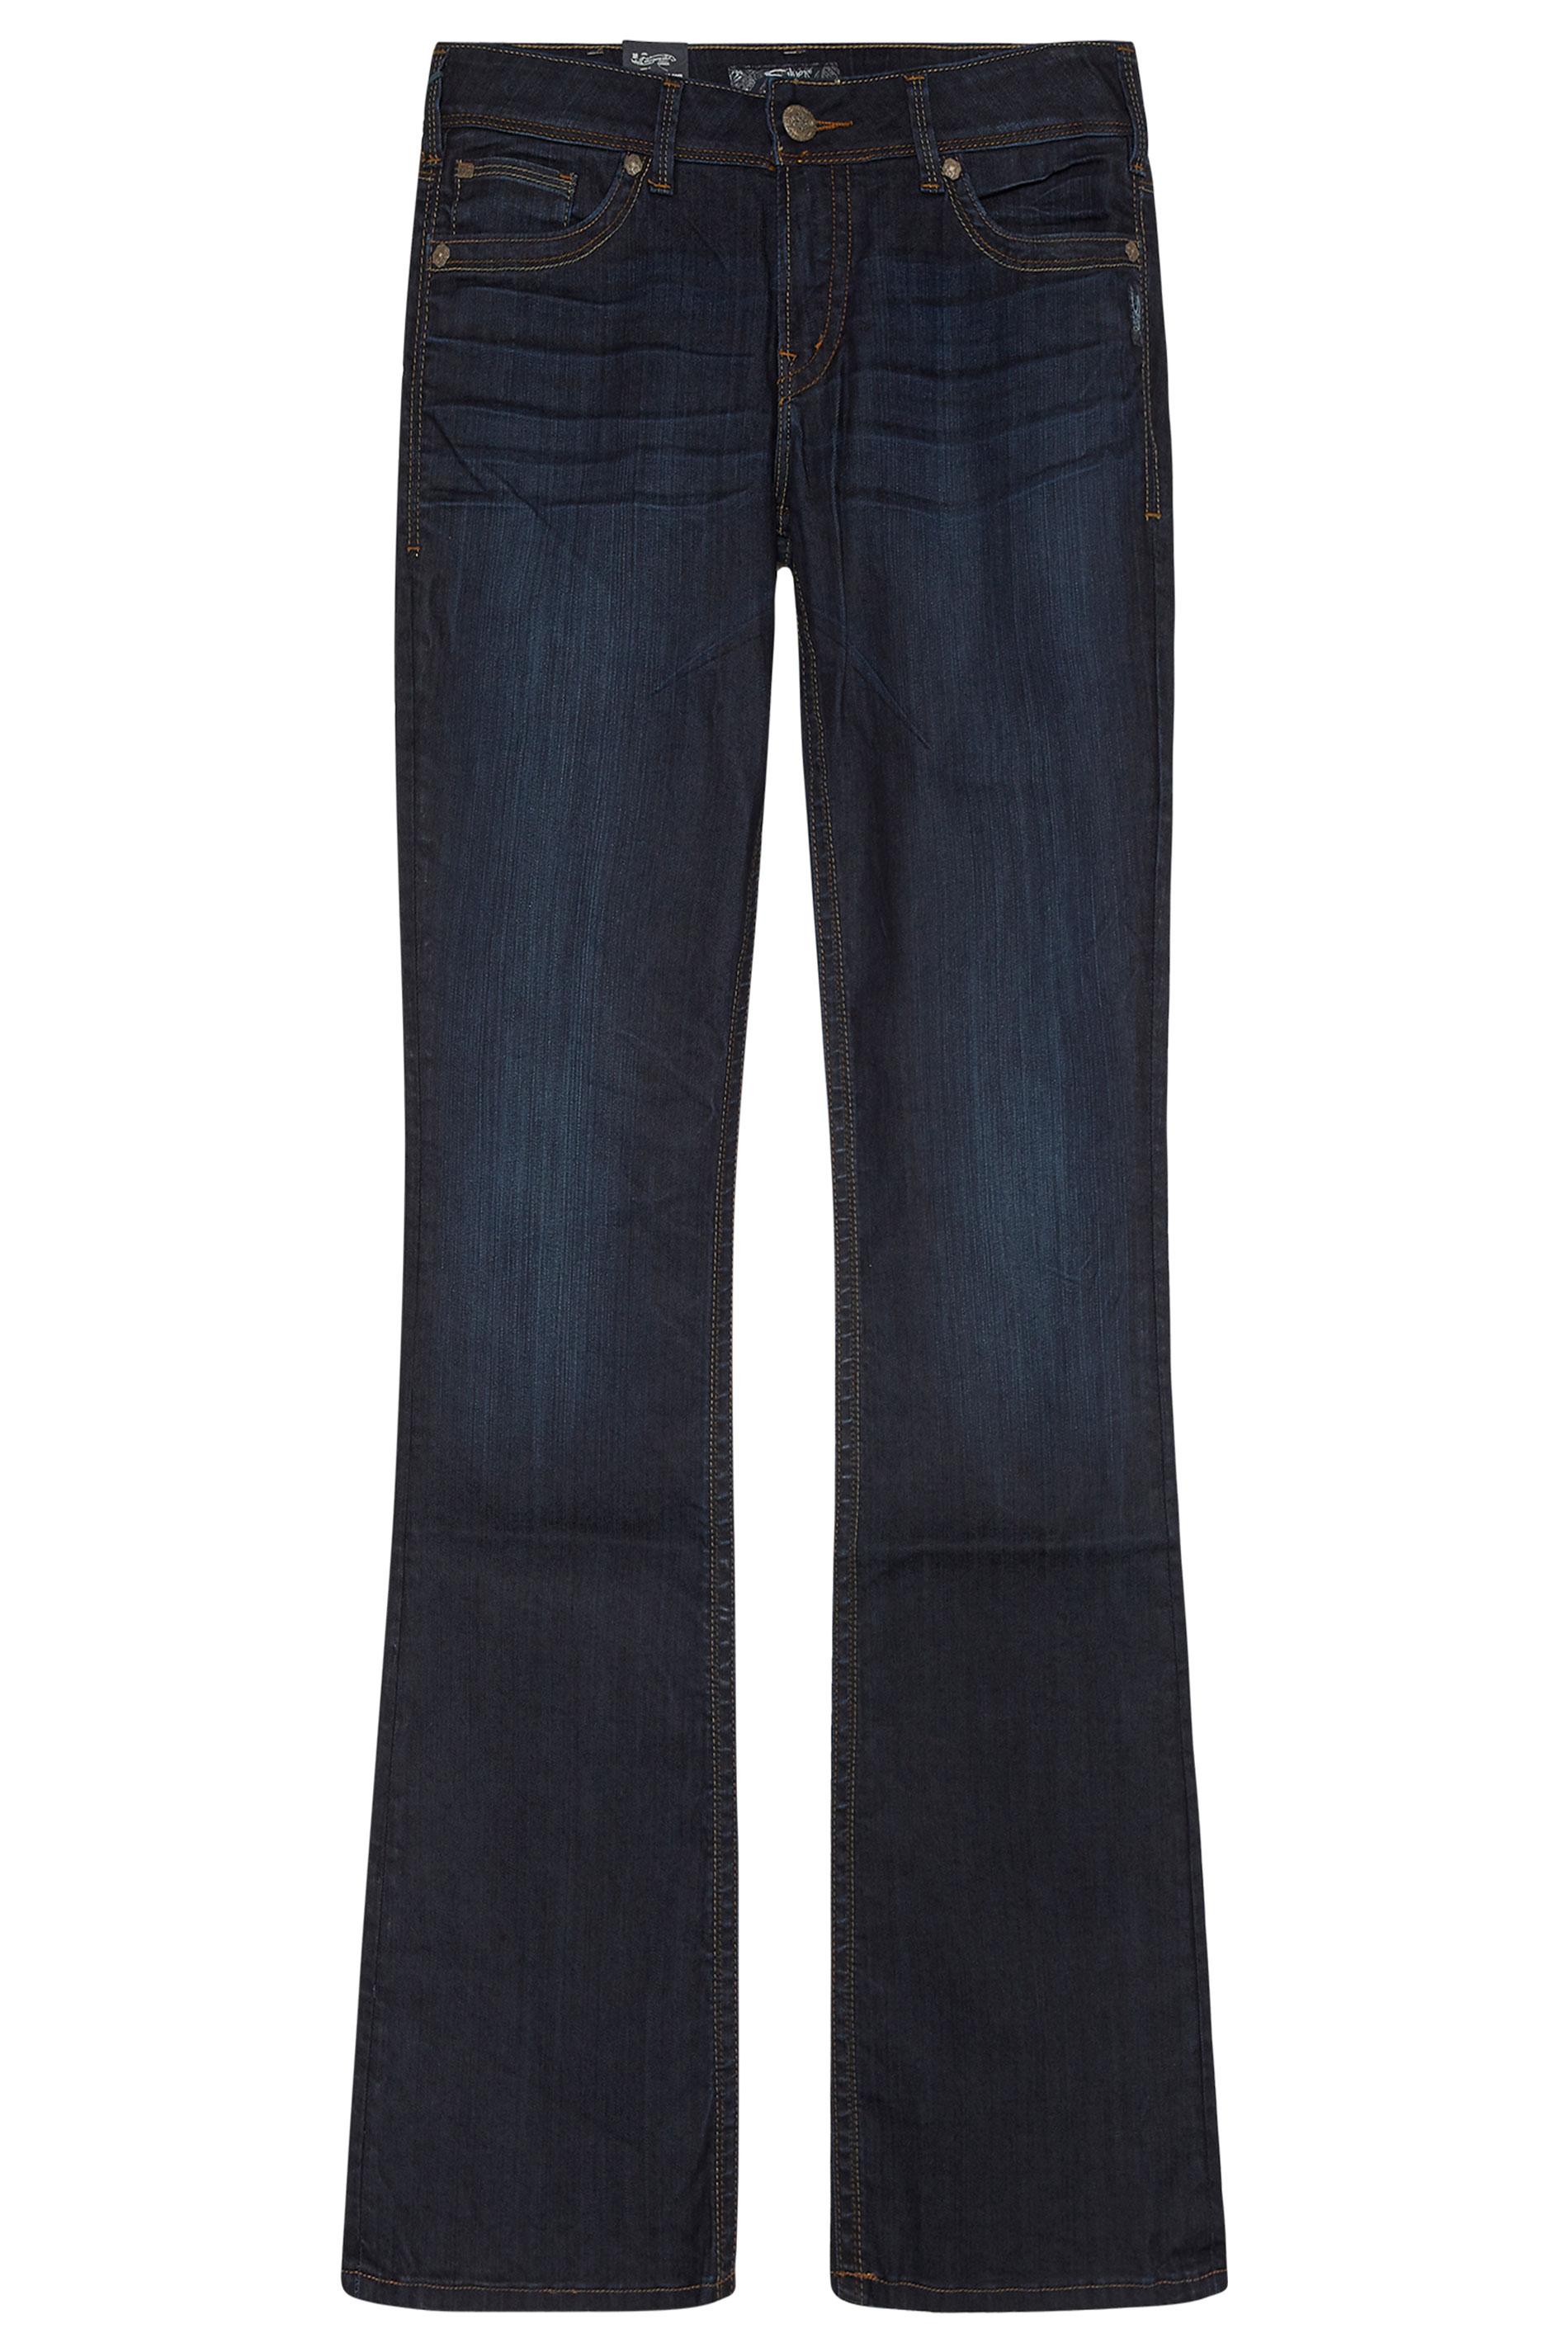 SILVER JEANS Blue Suki Bootcut Jeans